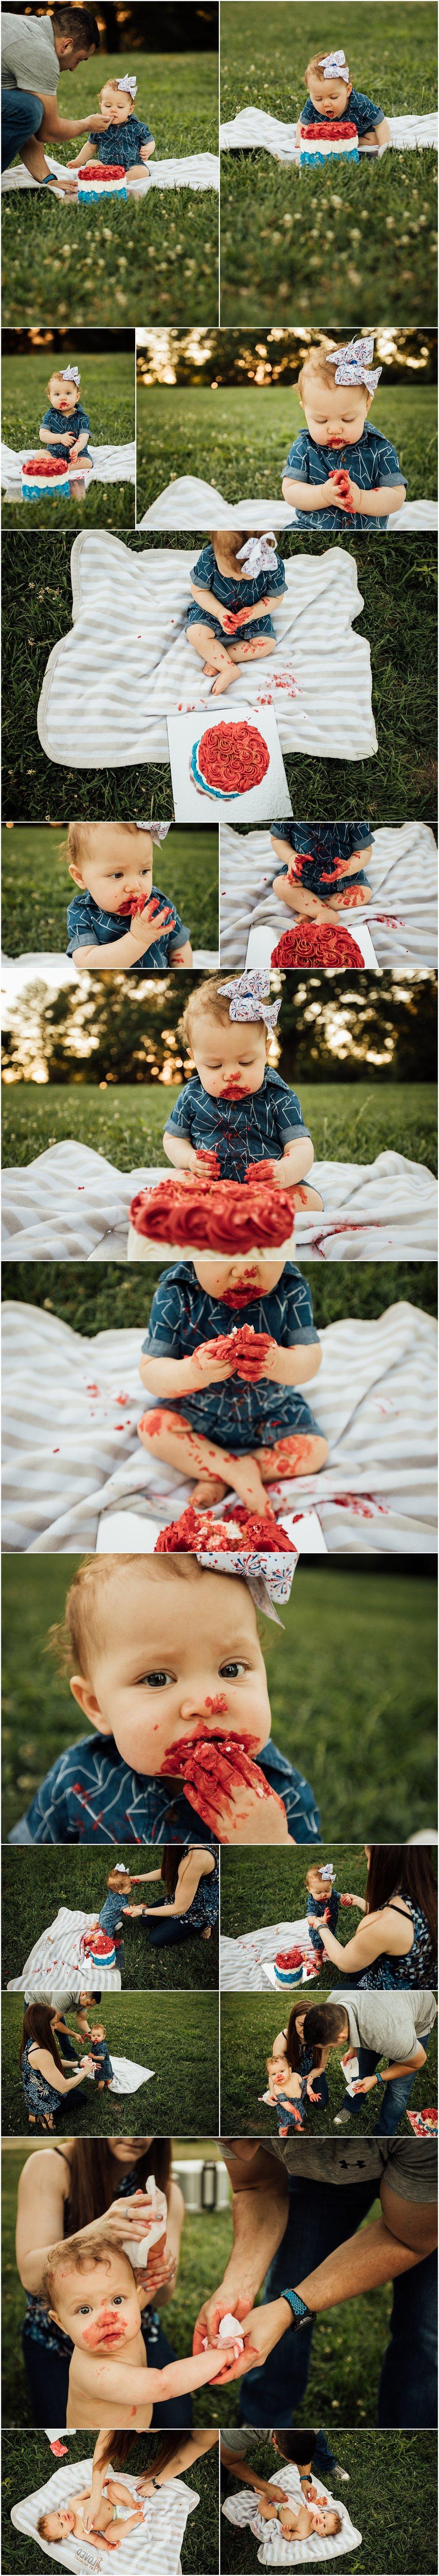 Cake smash and family session at park by Huntsville Alabama photographer Rachel K Photo